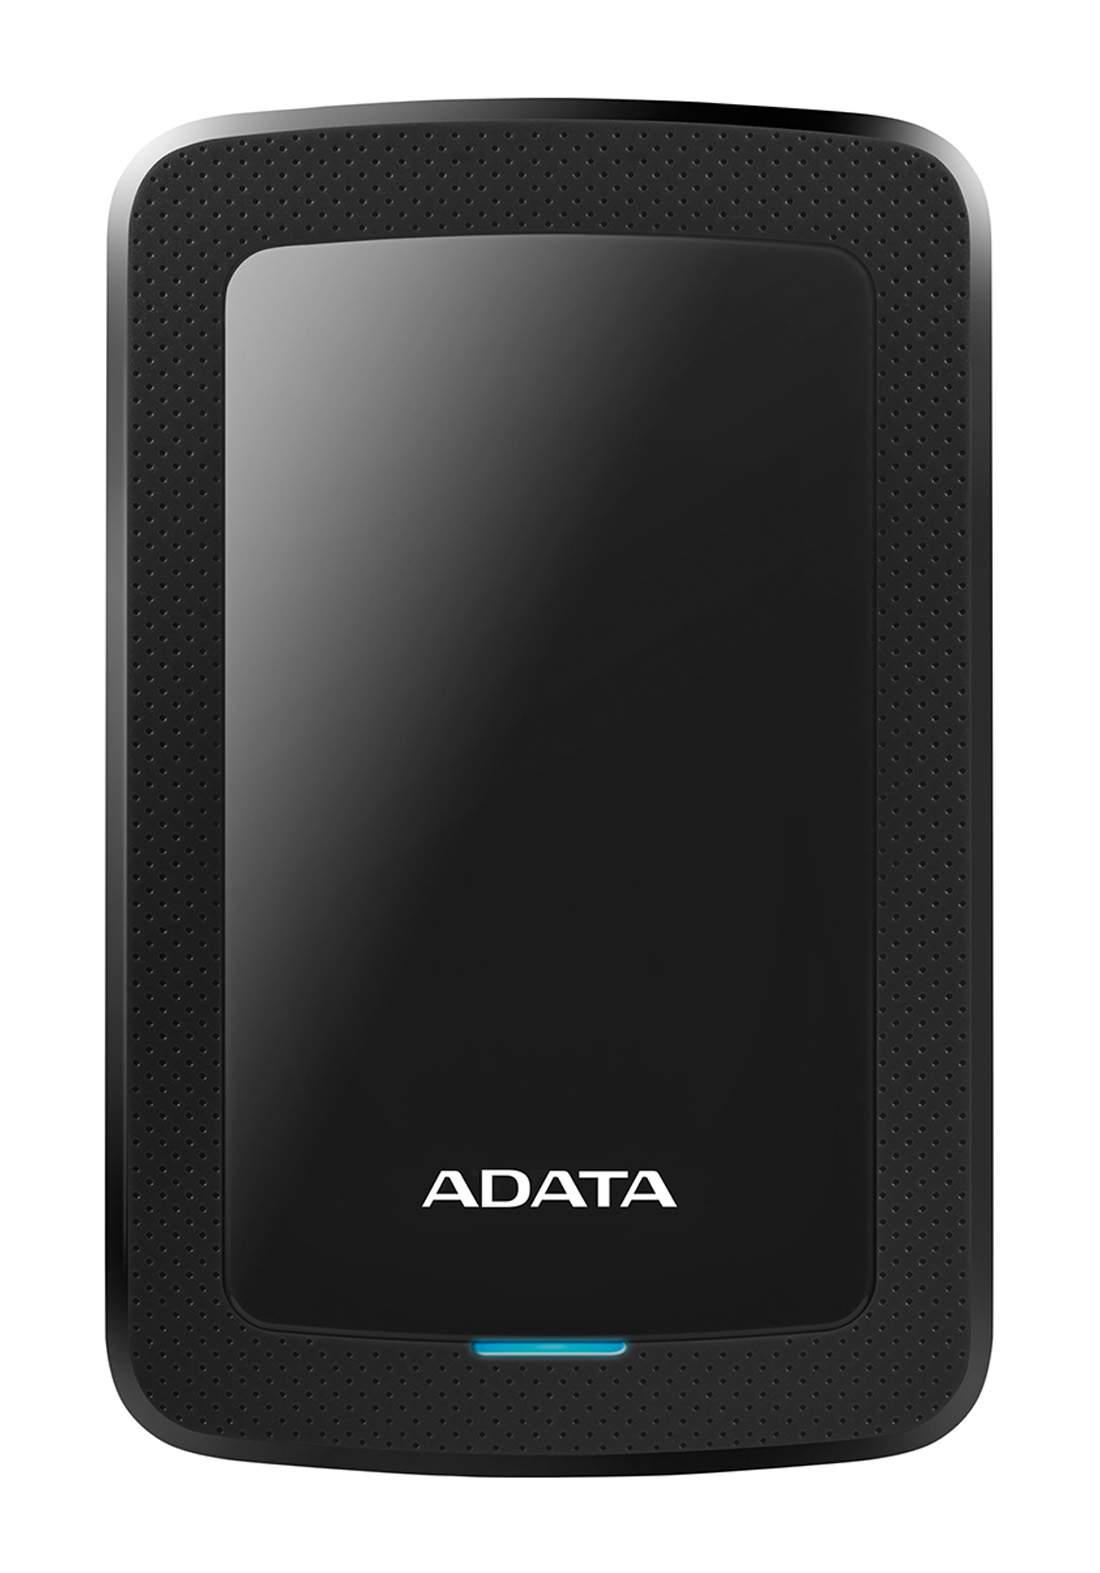 ADATA HV300 2TB Silm External Hard Drive - Black هارد خارجي